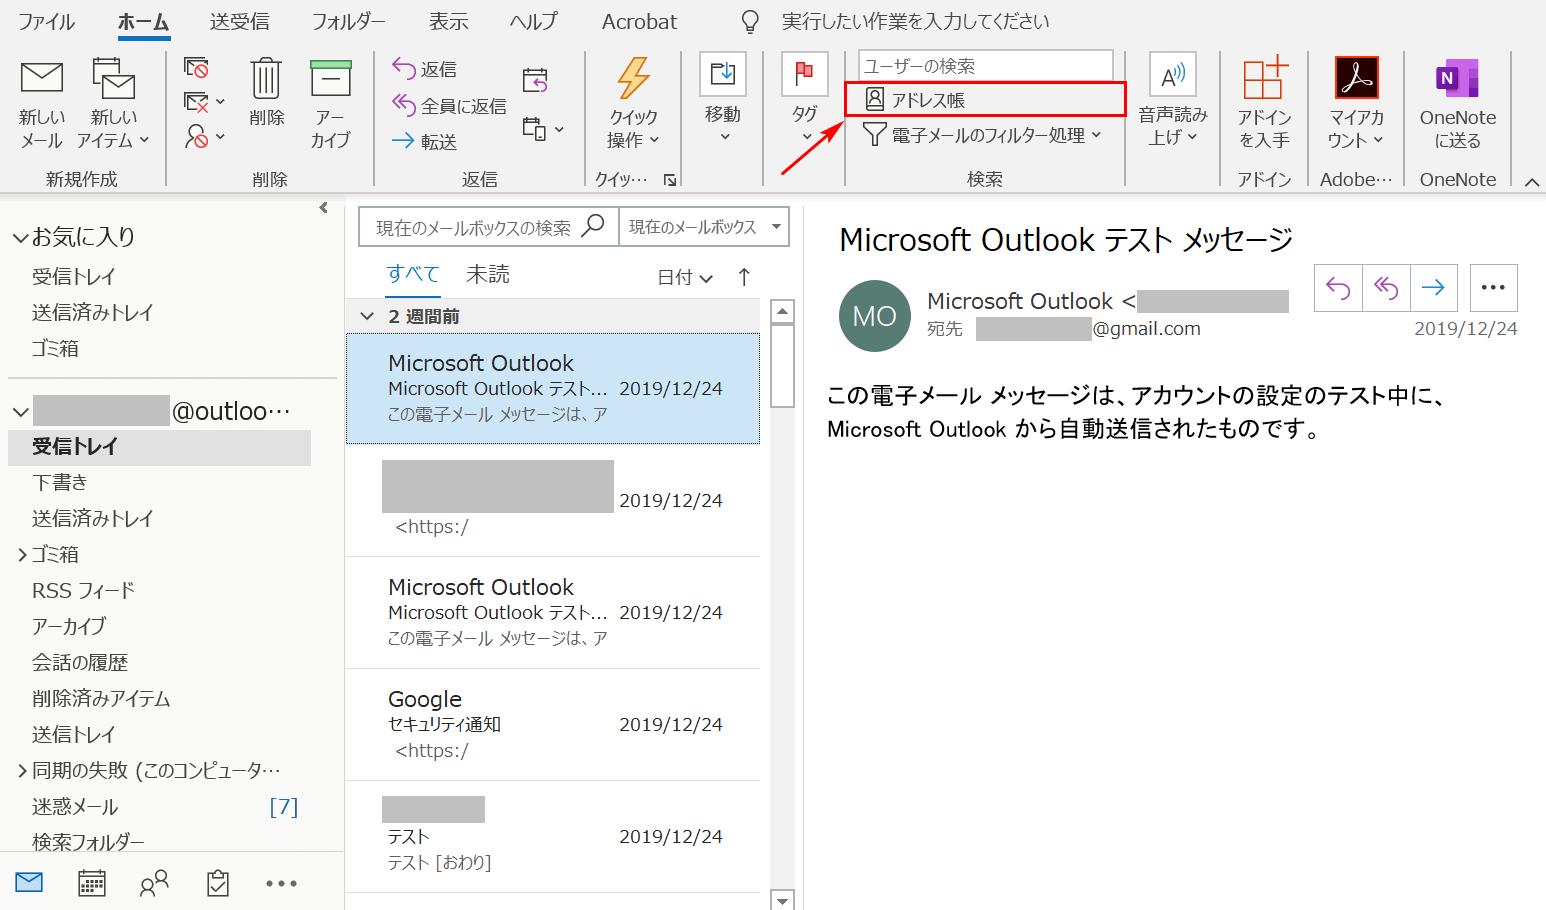 Outlook アドレス 帳 移行